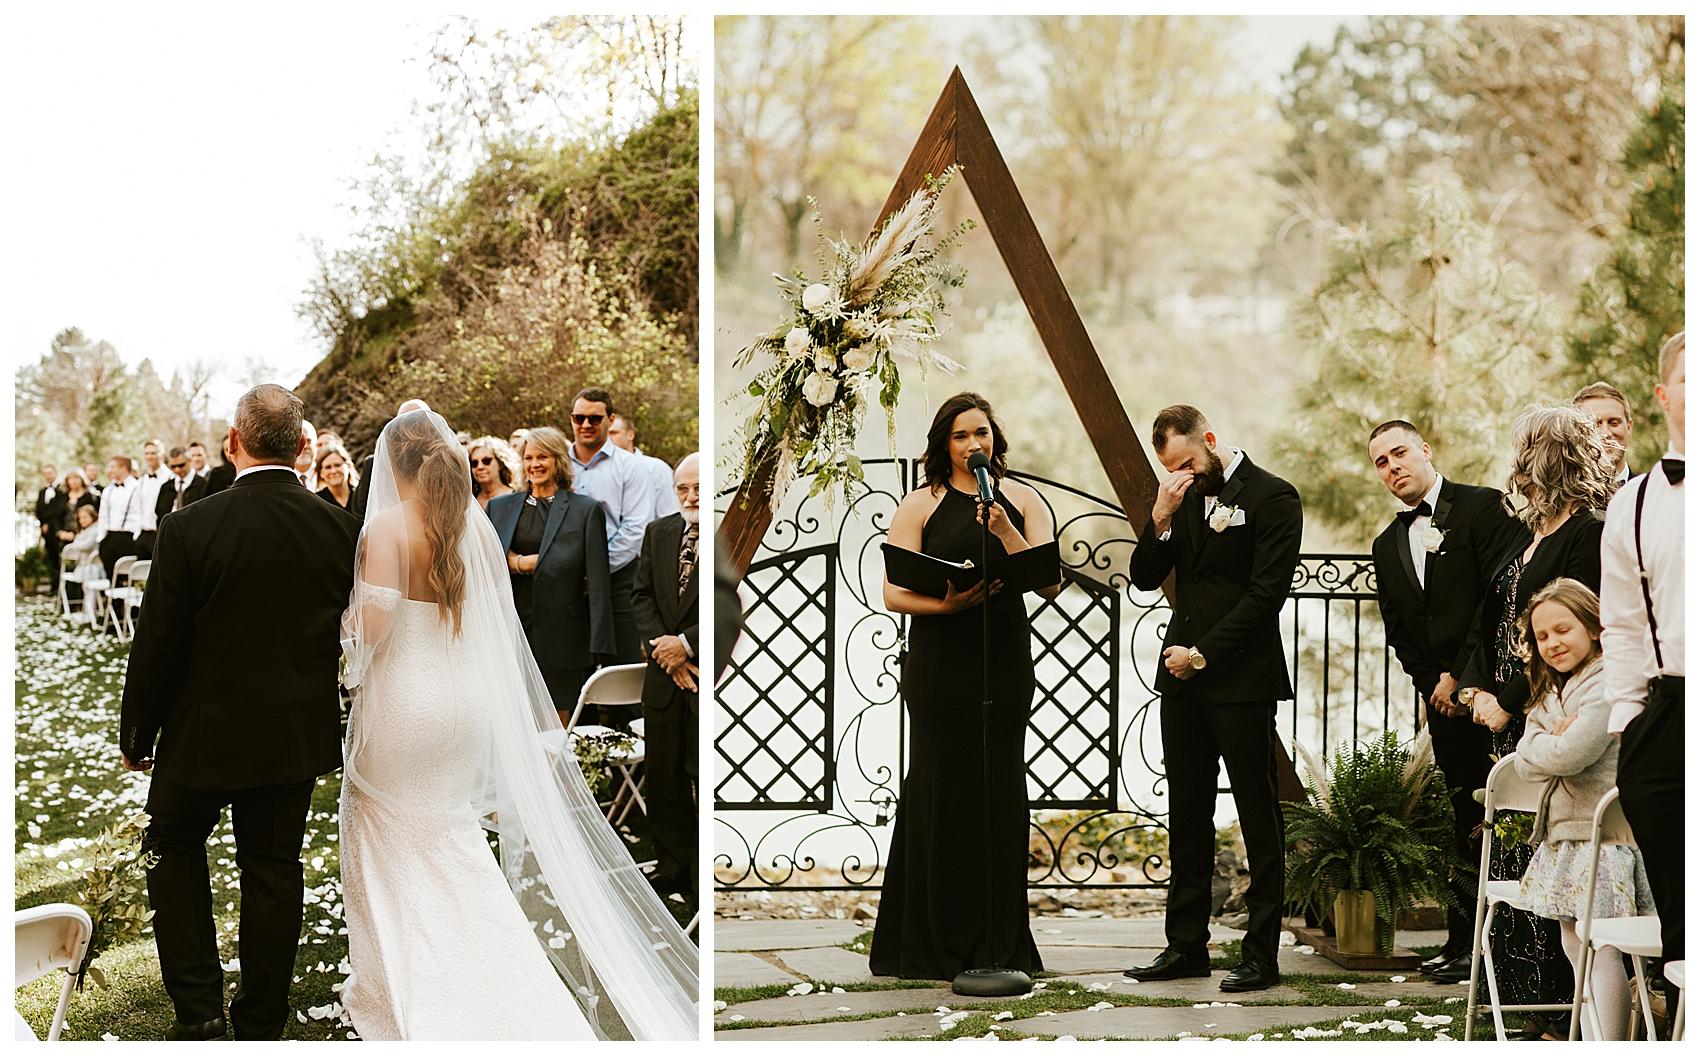 Chateau Rive Spokane Wedding Cassie Trottier Photography01049.jpg